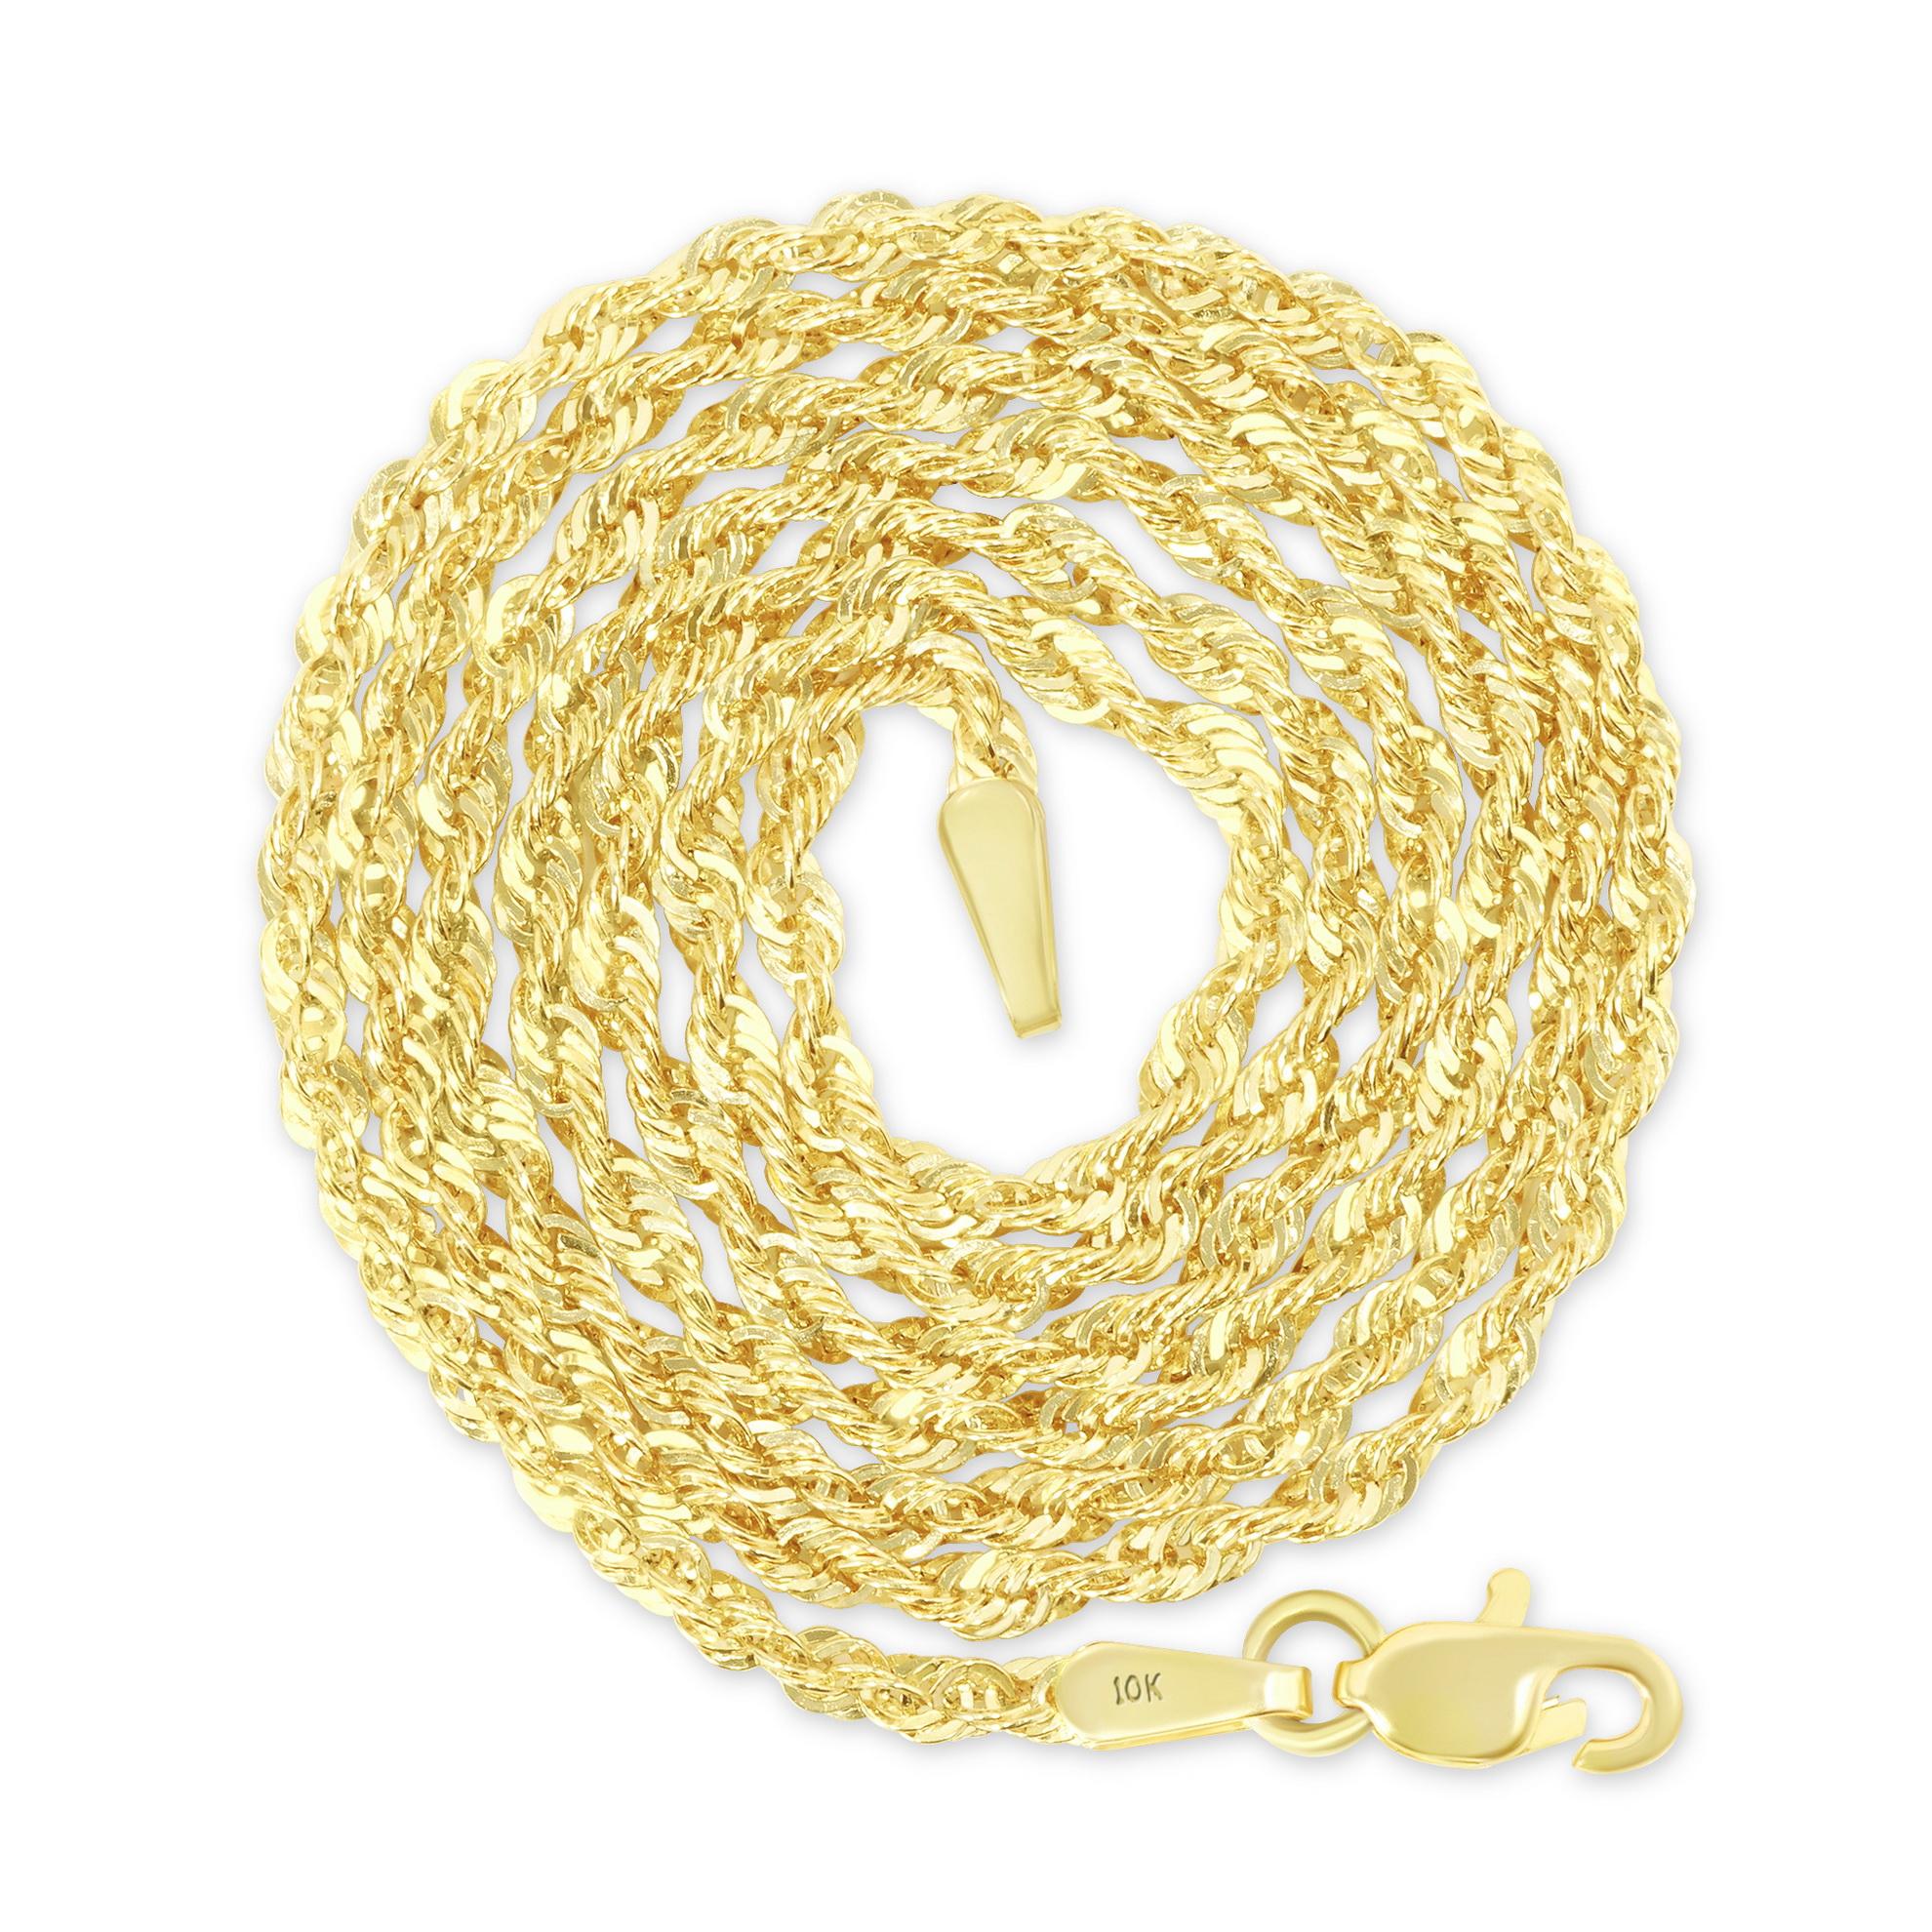 "10K Yellow Gold Light 1.5mm-4mm Diamond Cut Rope Chain Pendant Necklace 14""- 30"" 11"